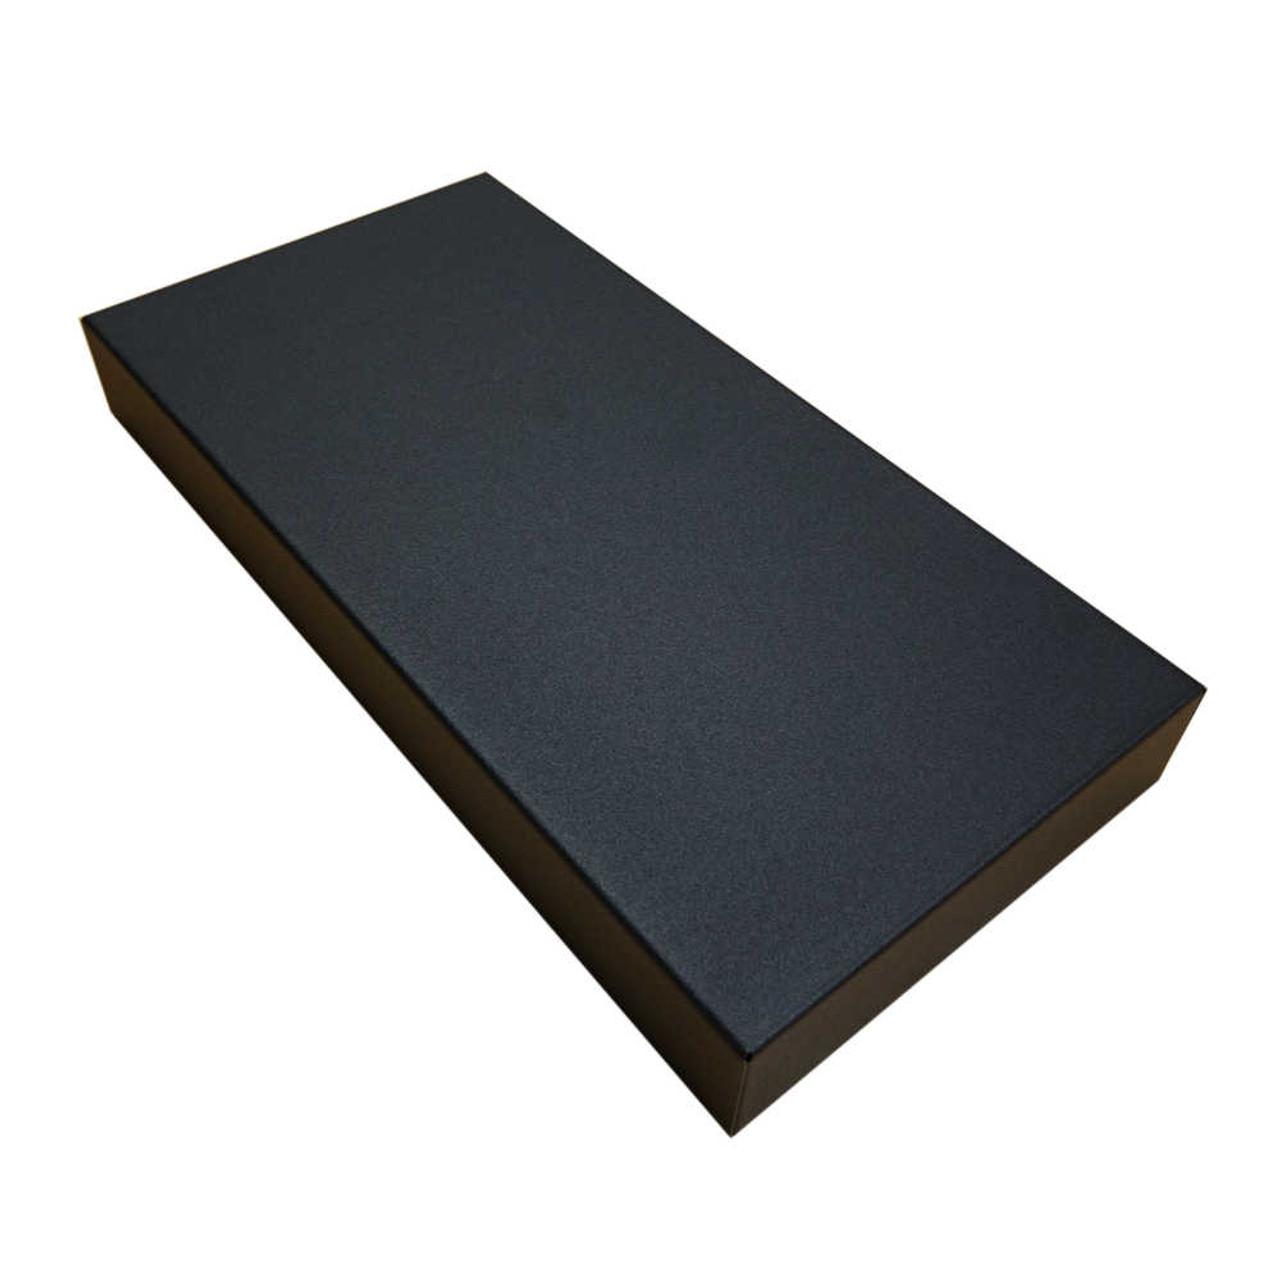 Hammond 1441-26BK3 - Black Steel Chassis 16x8x2